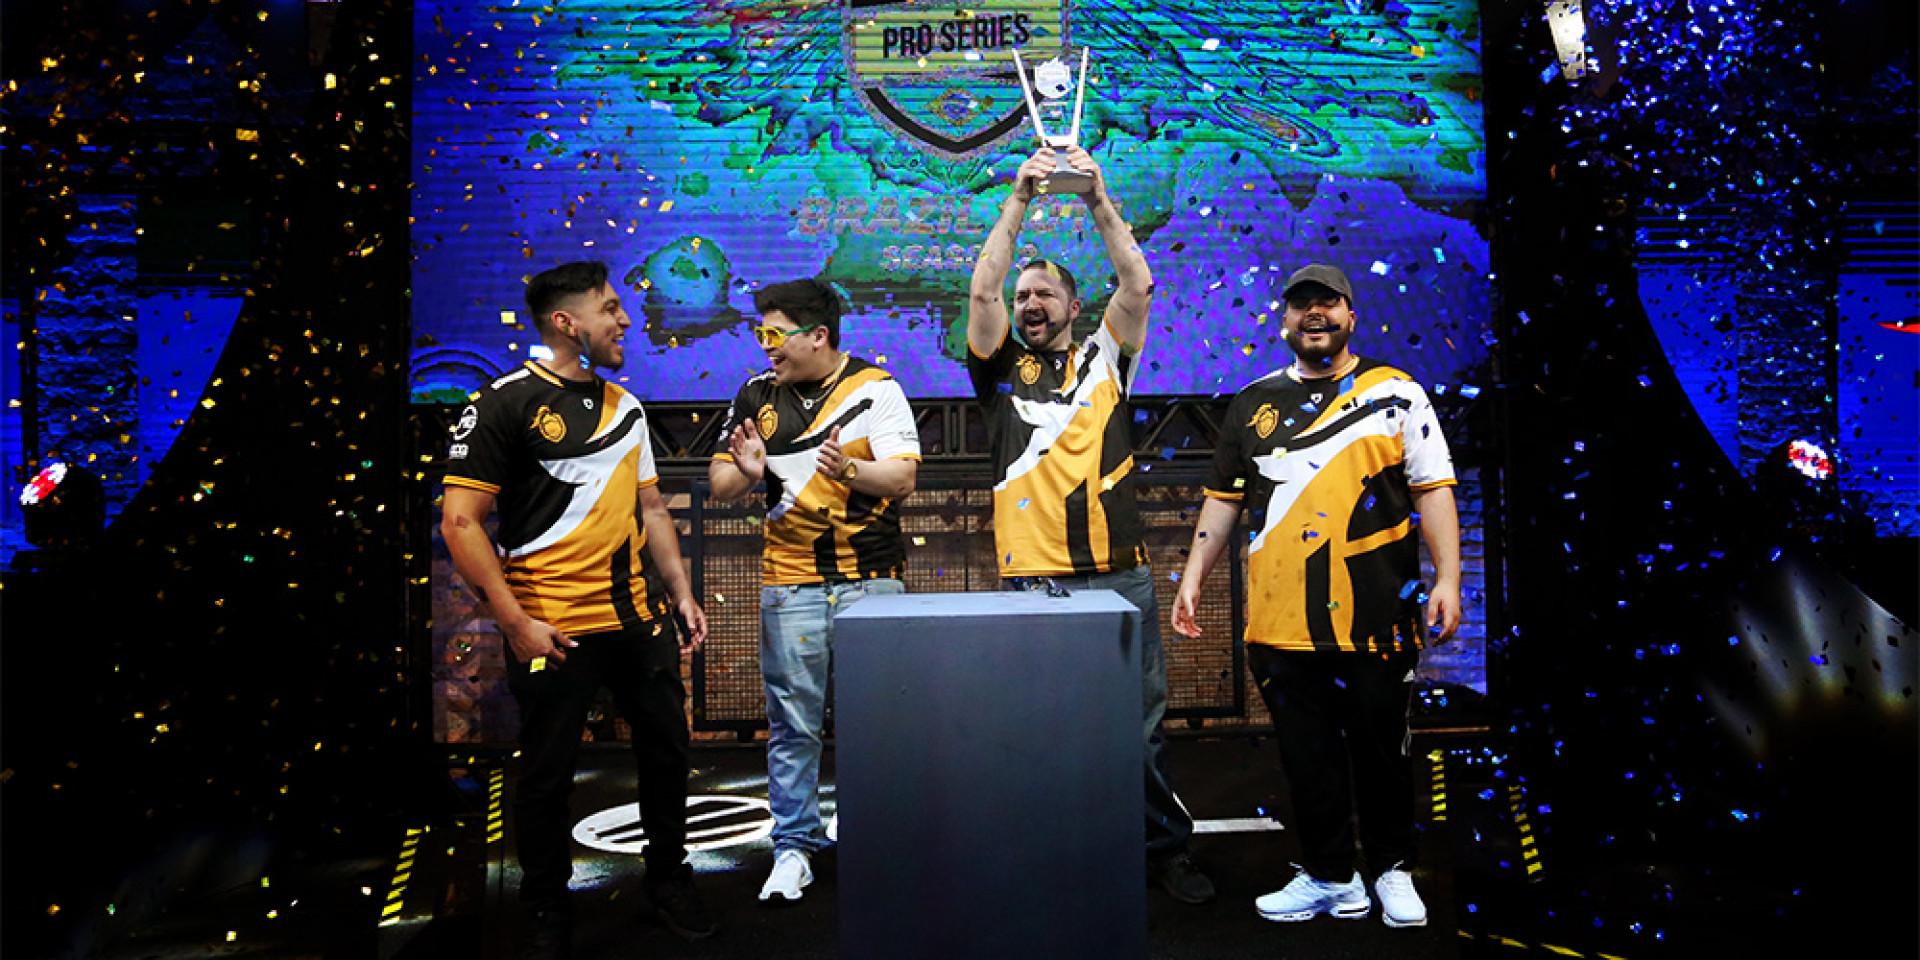 Gods of Boom introduces future esports plans